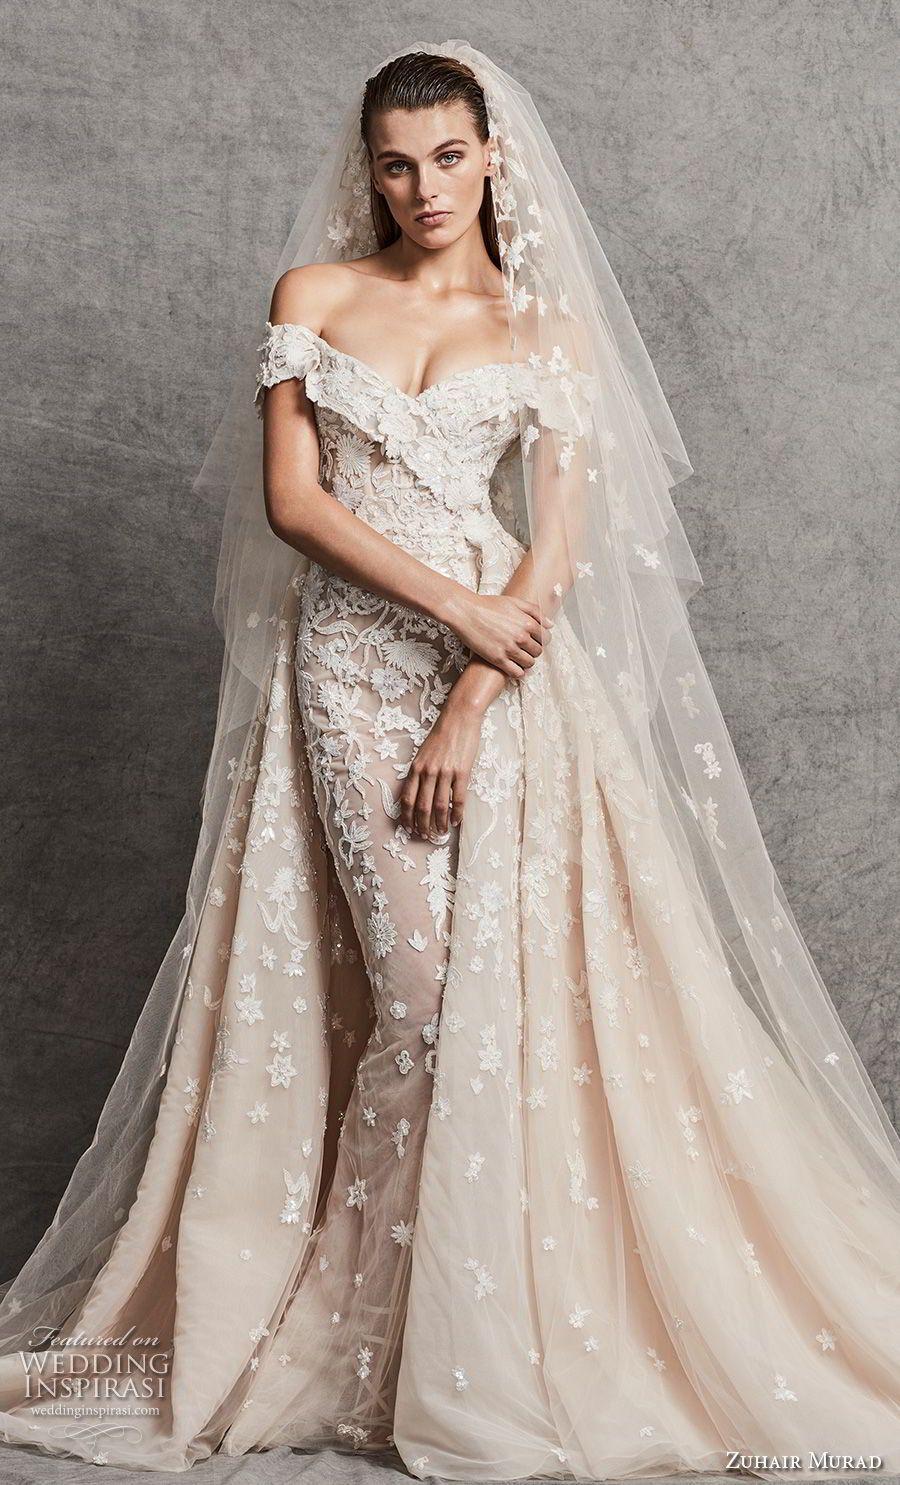 Wedding dress without train  Zuhair Murad Fall  Wedding Dresses  Chapel train Zuhair murad